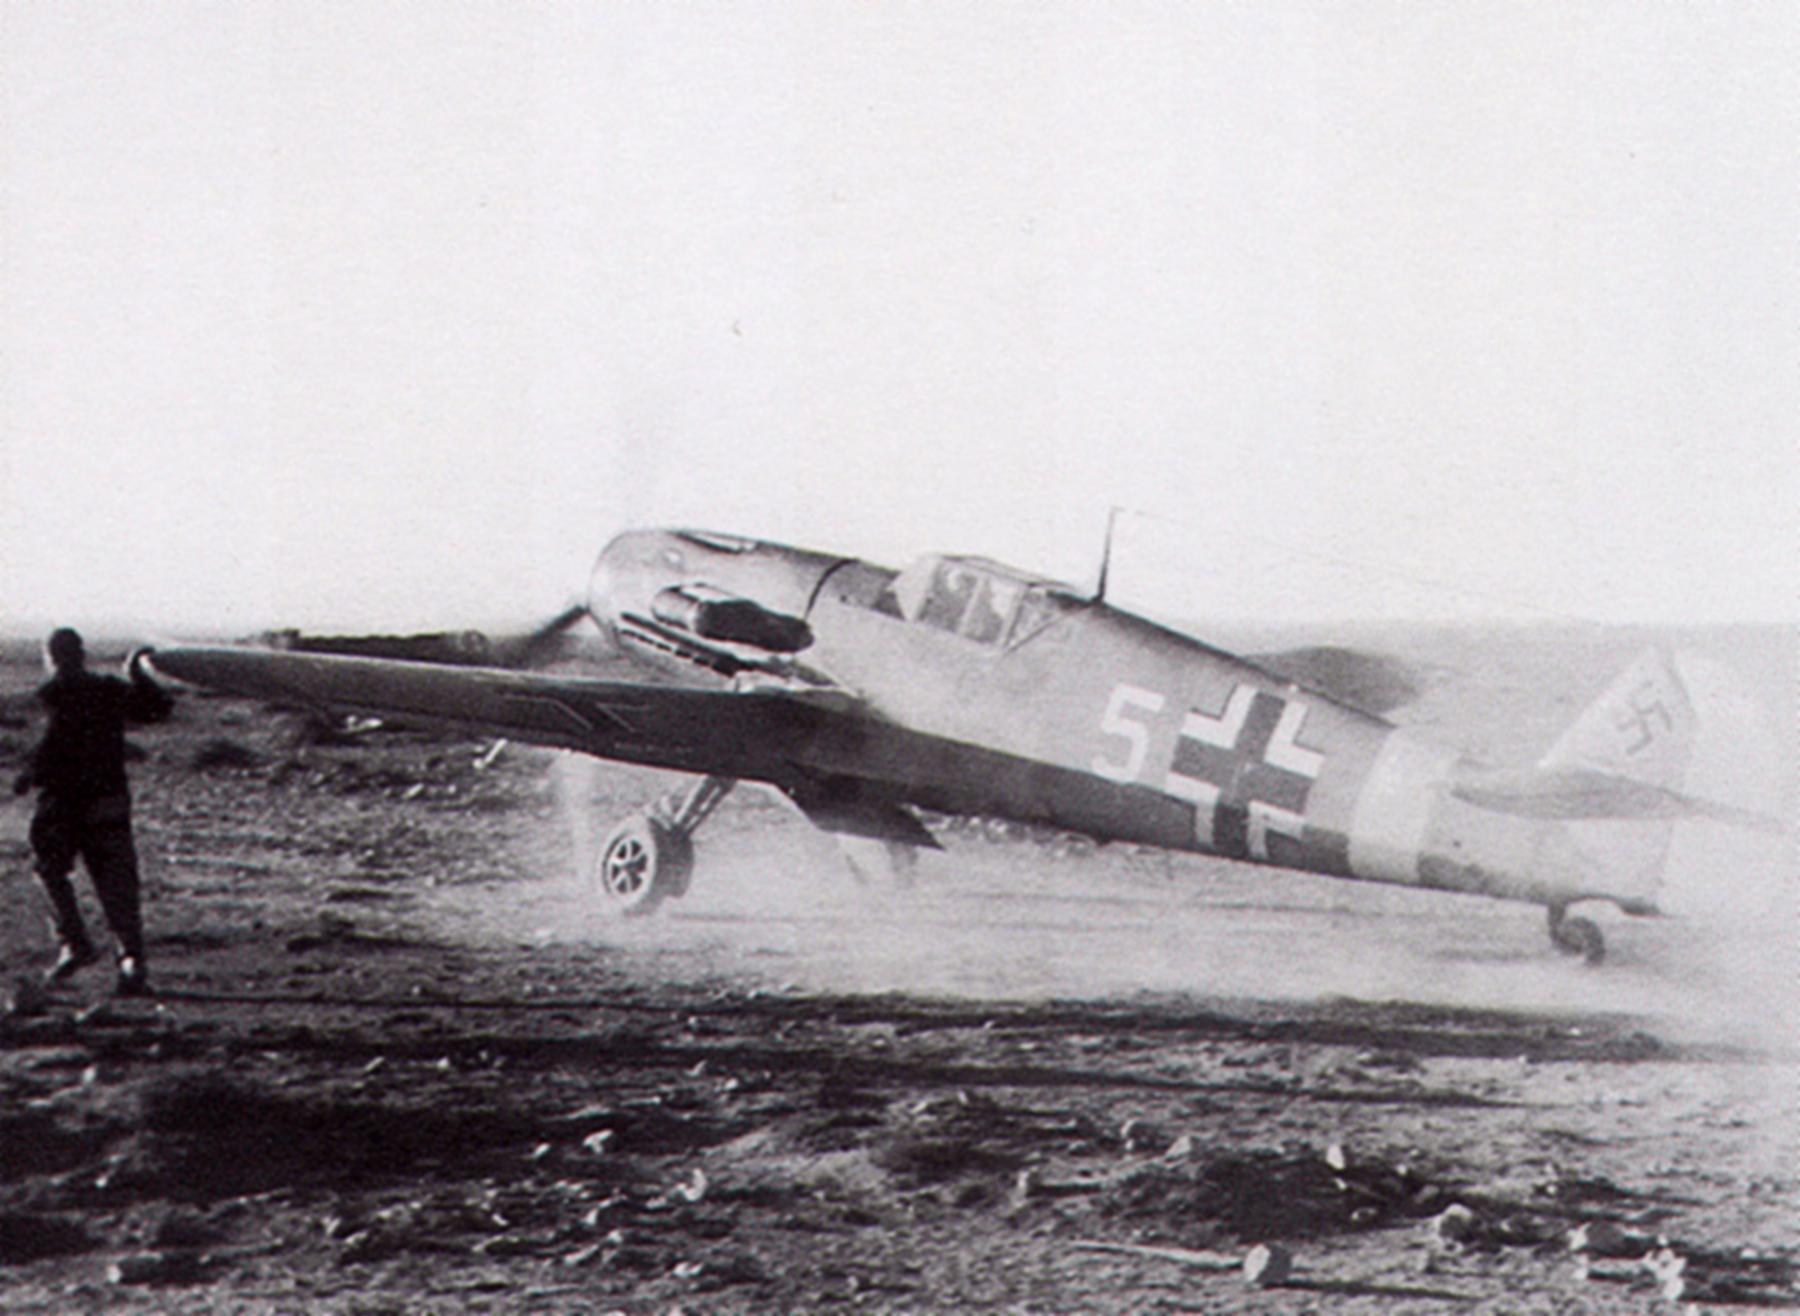 Messerschmitt Bf 109F4Trop 1.JG27 White 5 Albert Espenlaub El Adem 25th Nov 1941 01